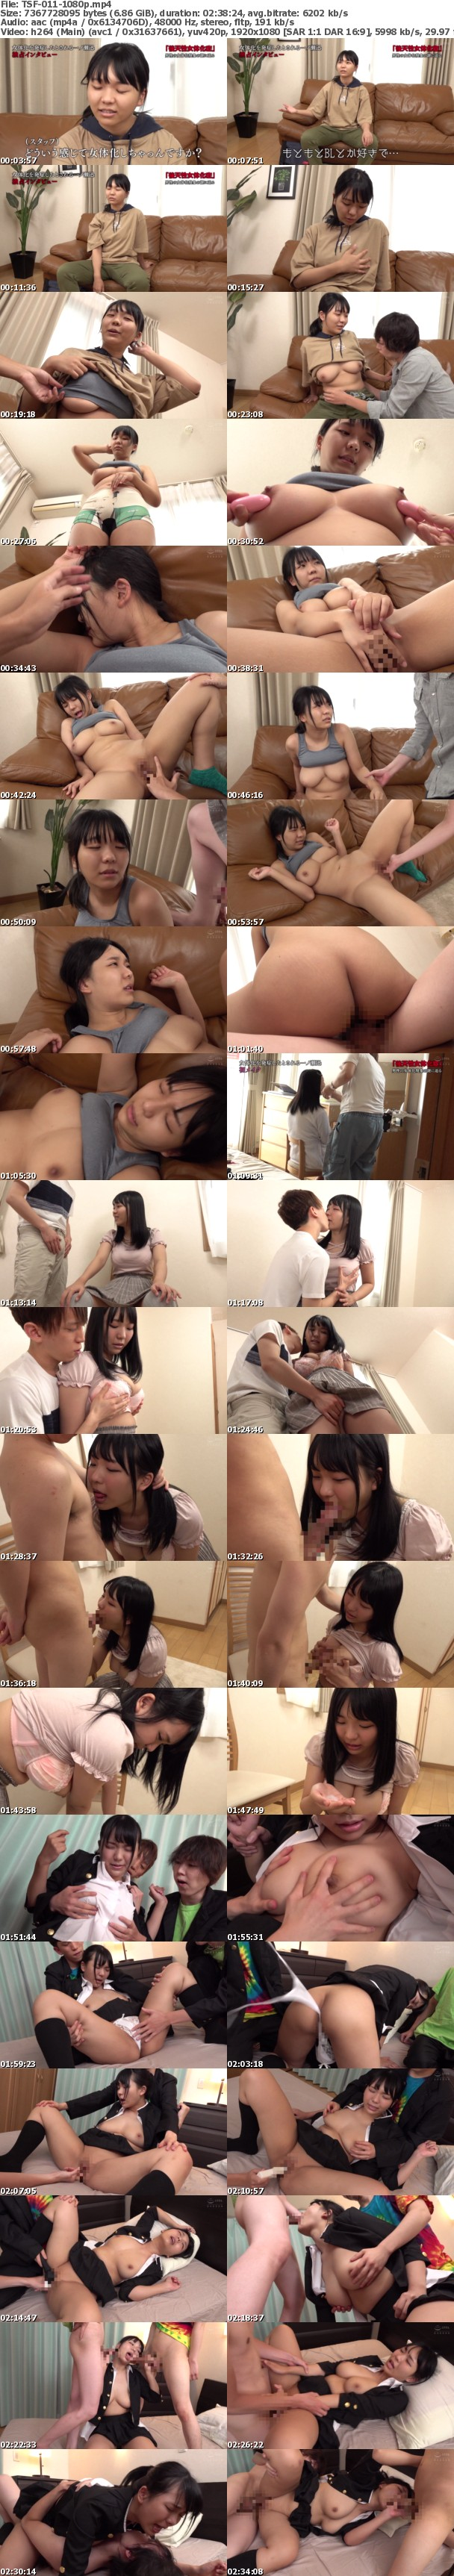 (Full HD) TSF-011 朝起きたら女になっていた男子大学生(20)を徹底取材 シチュエーションに拘るBL好きな腐男子クンをメス堕ちさせる 一ノ瀬迅